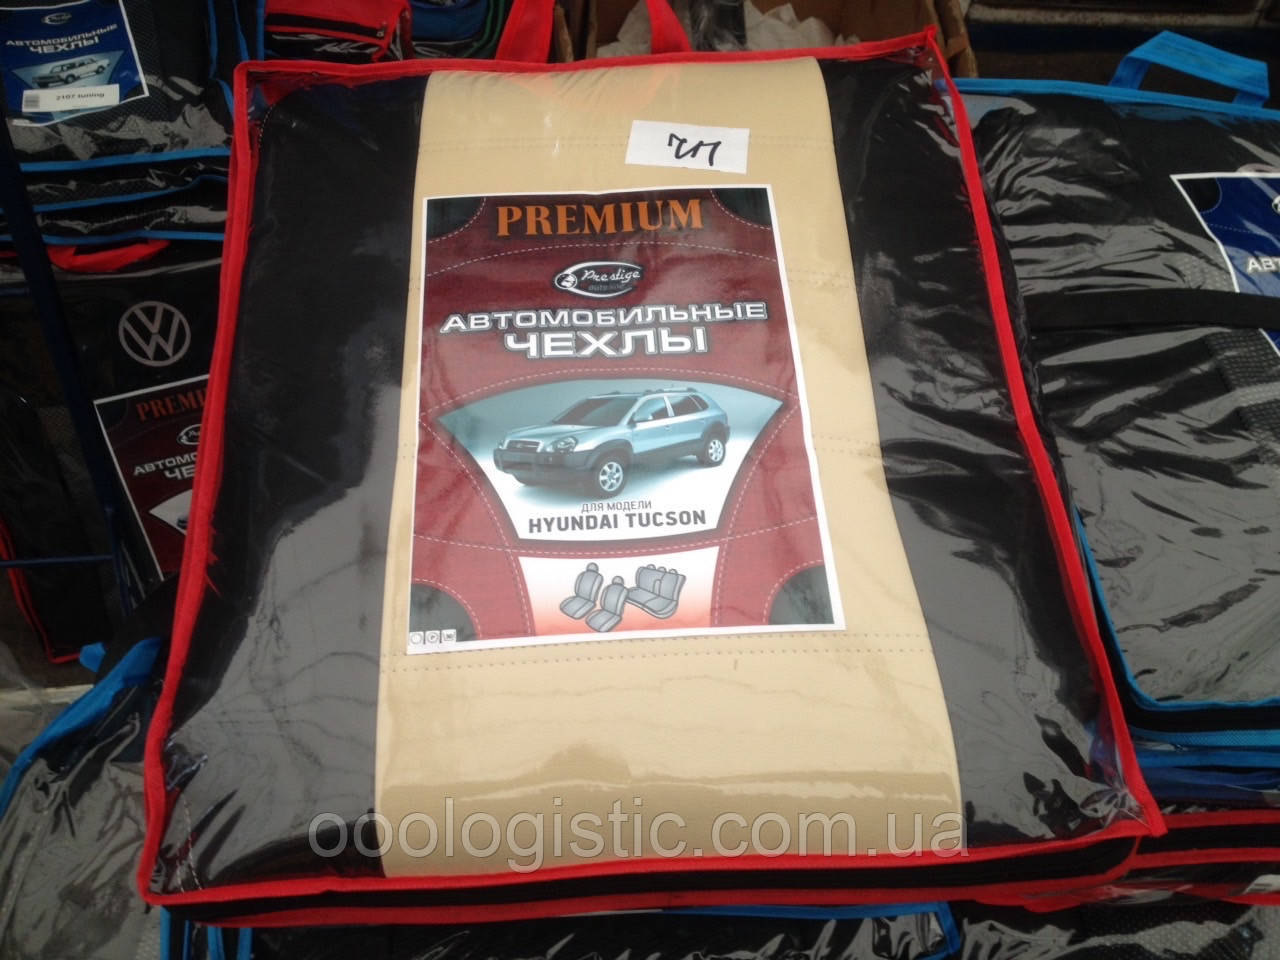 Авточехлы Prestige из эко кожи на Hyundai Tucson,авточехлы Престиж для модели Хюндай Туксон